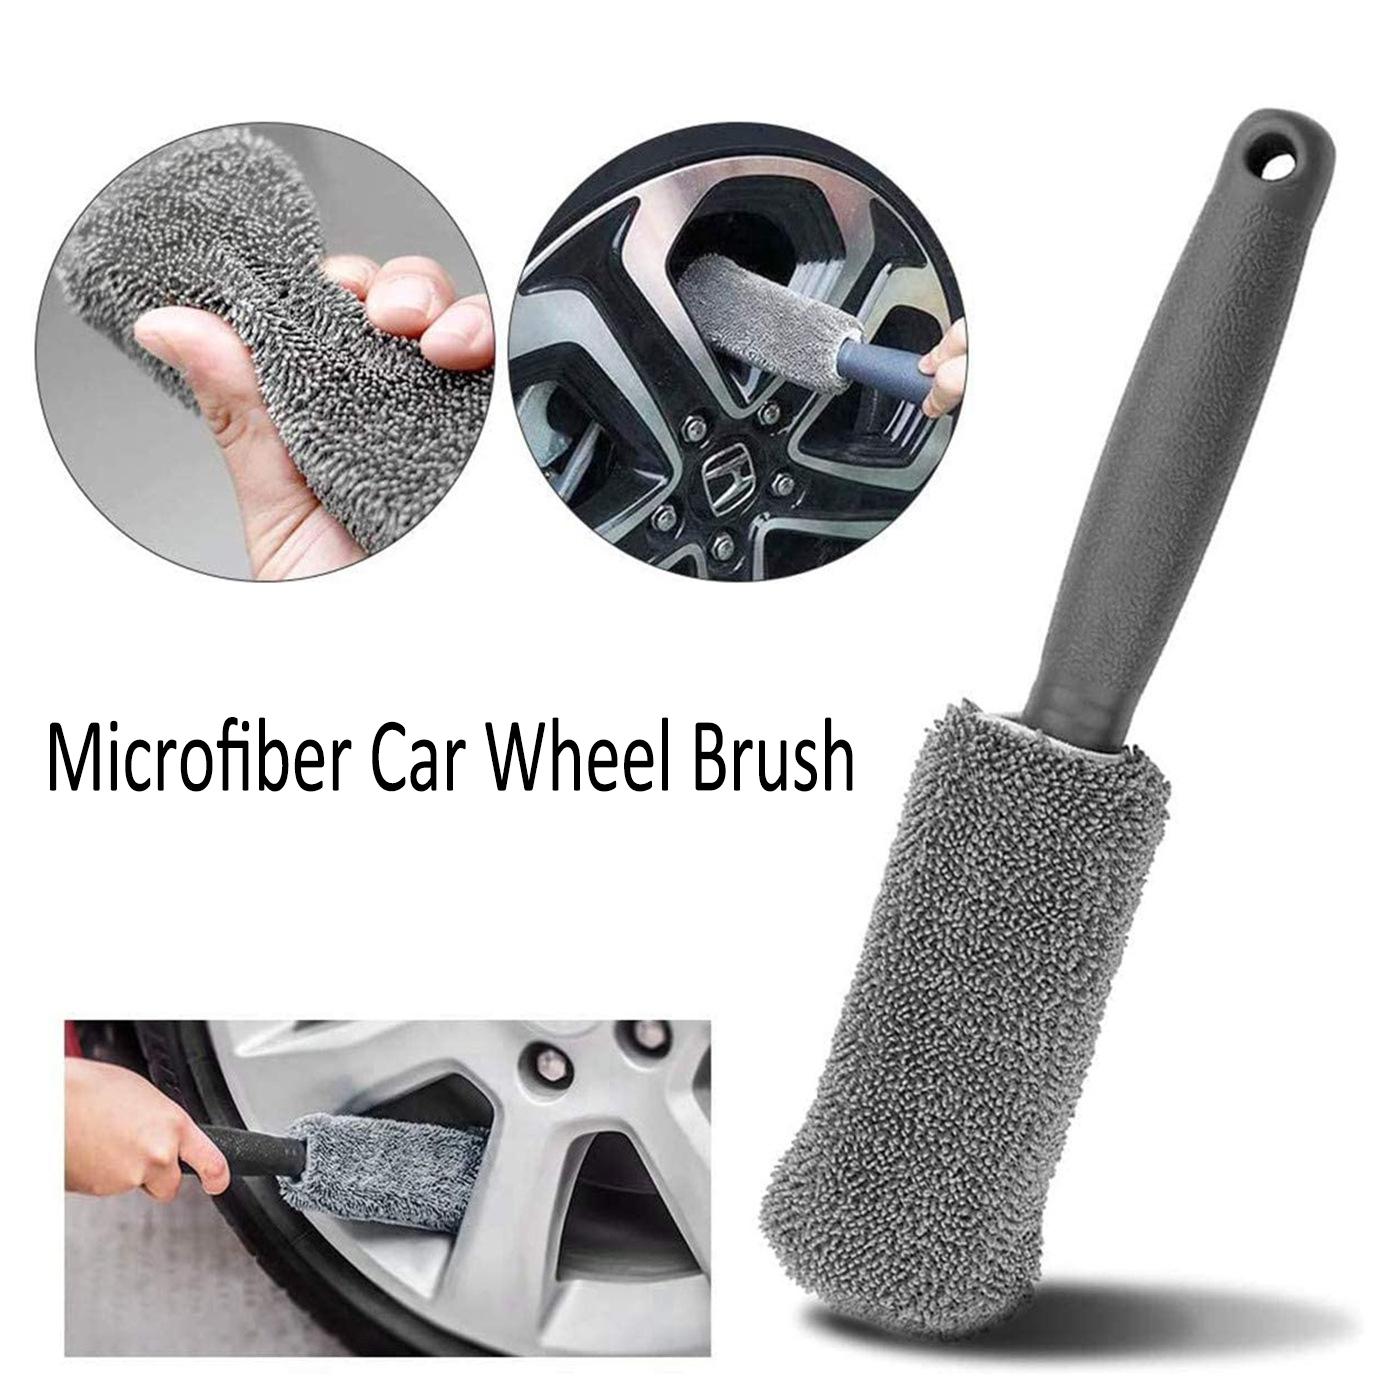 Garden Water Gun 0.9L Capacity Lightweight Garden Water Nozzle Spray Widely Used Plastic Snow Foam Lance Car Wash Set